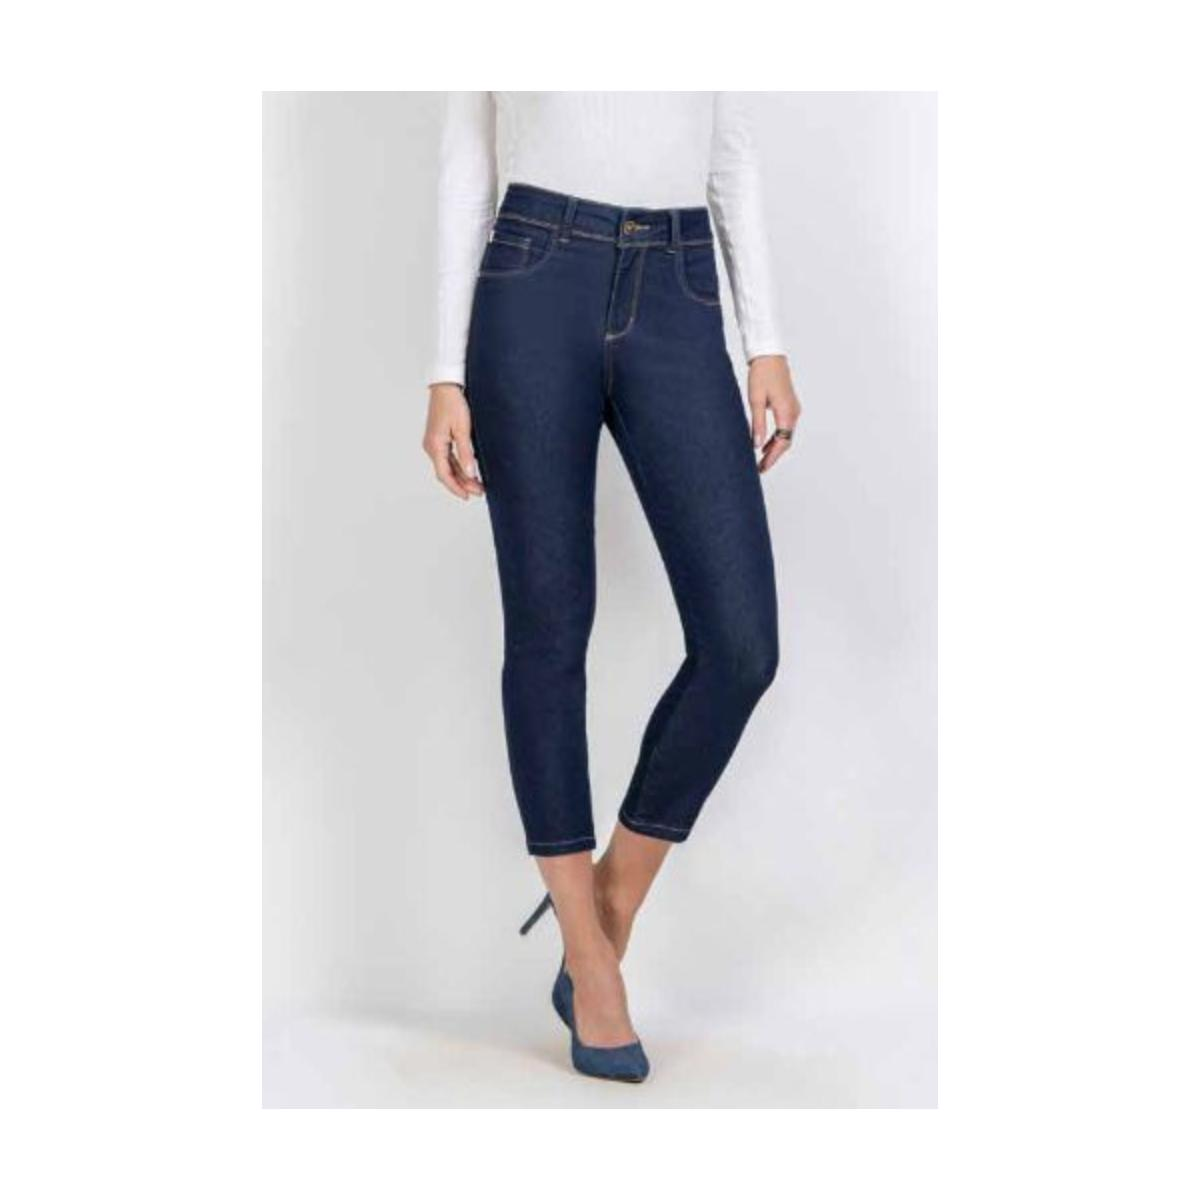 Calça Feminina Kacolako K37813 Jeans Escuro